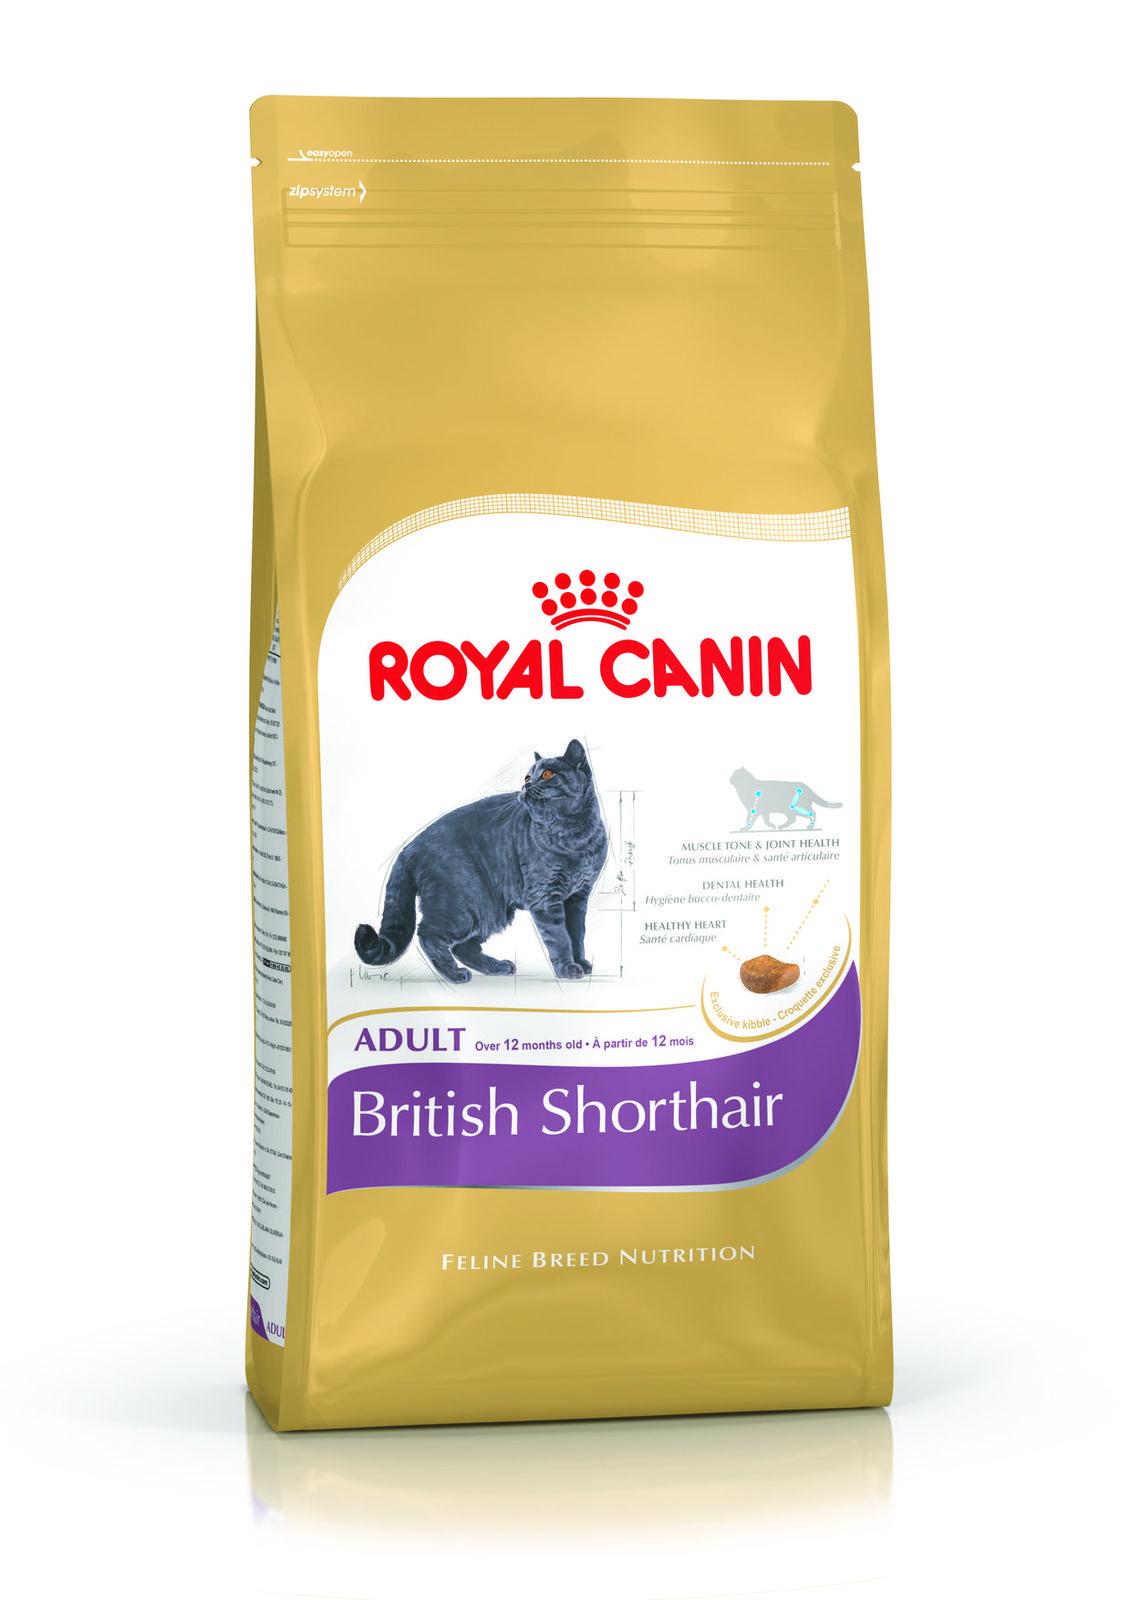 British Shorthair British shorthair, Dry cat food, Cat food